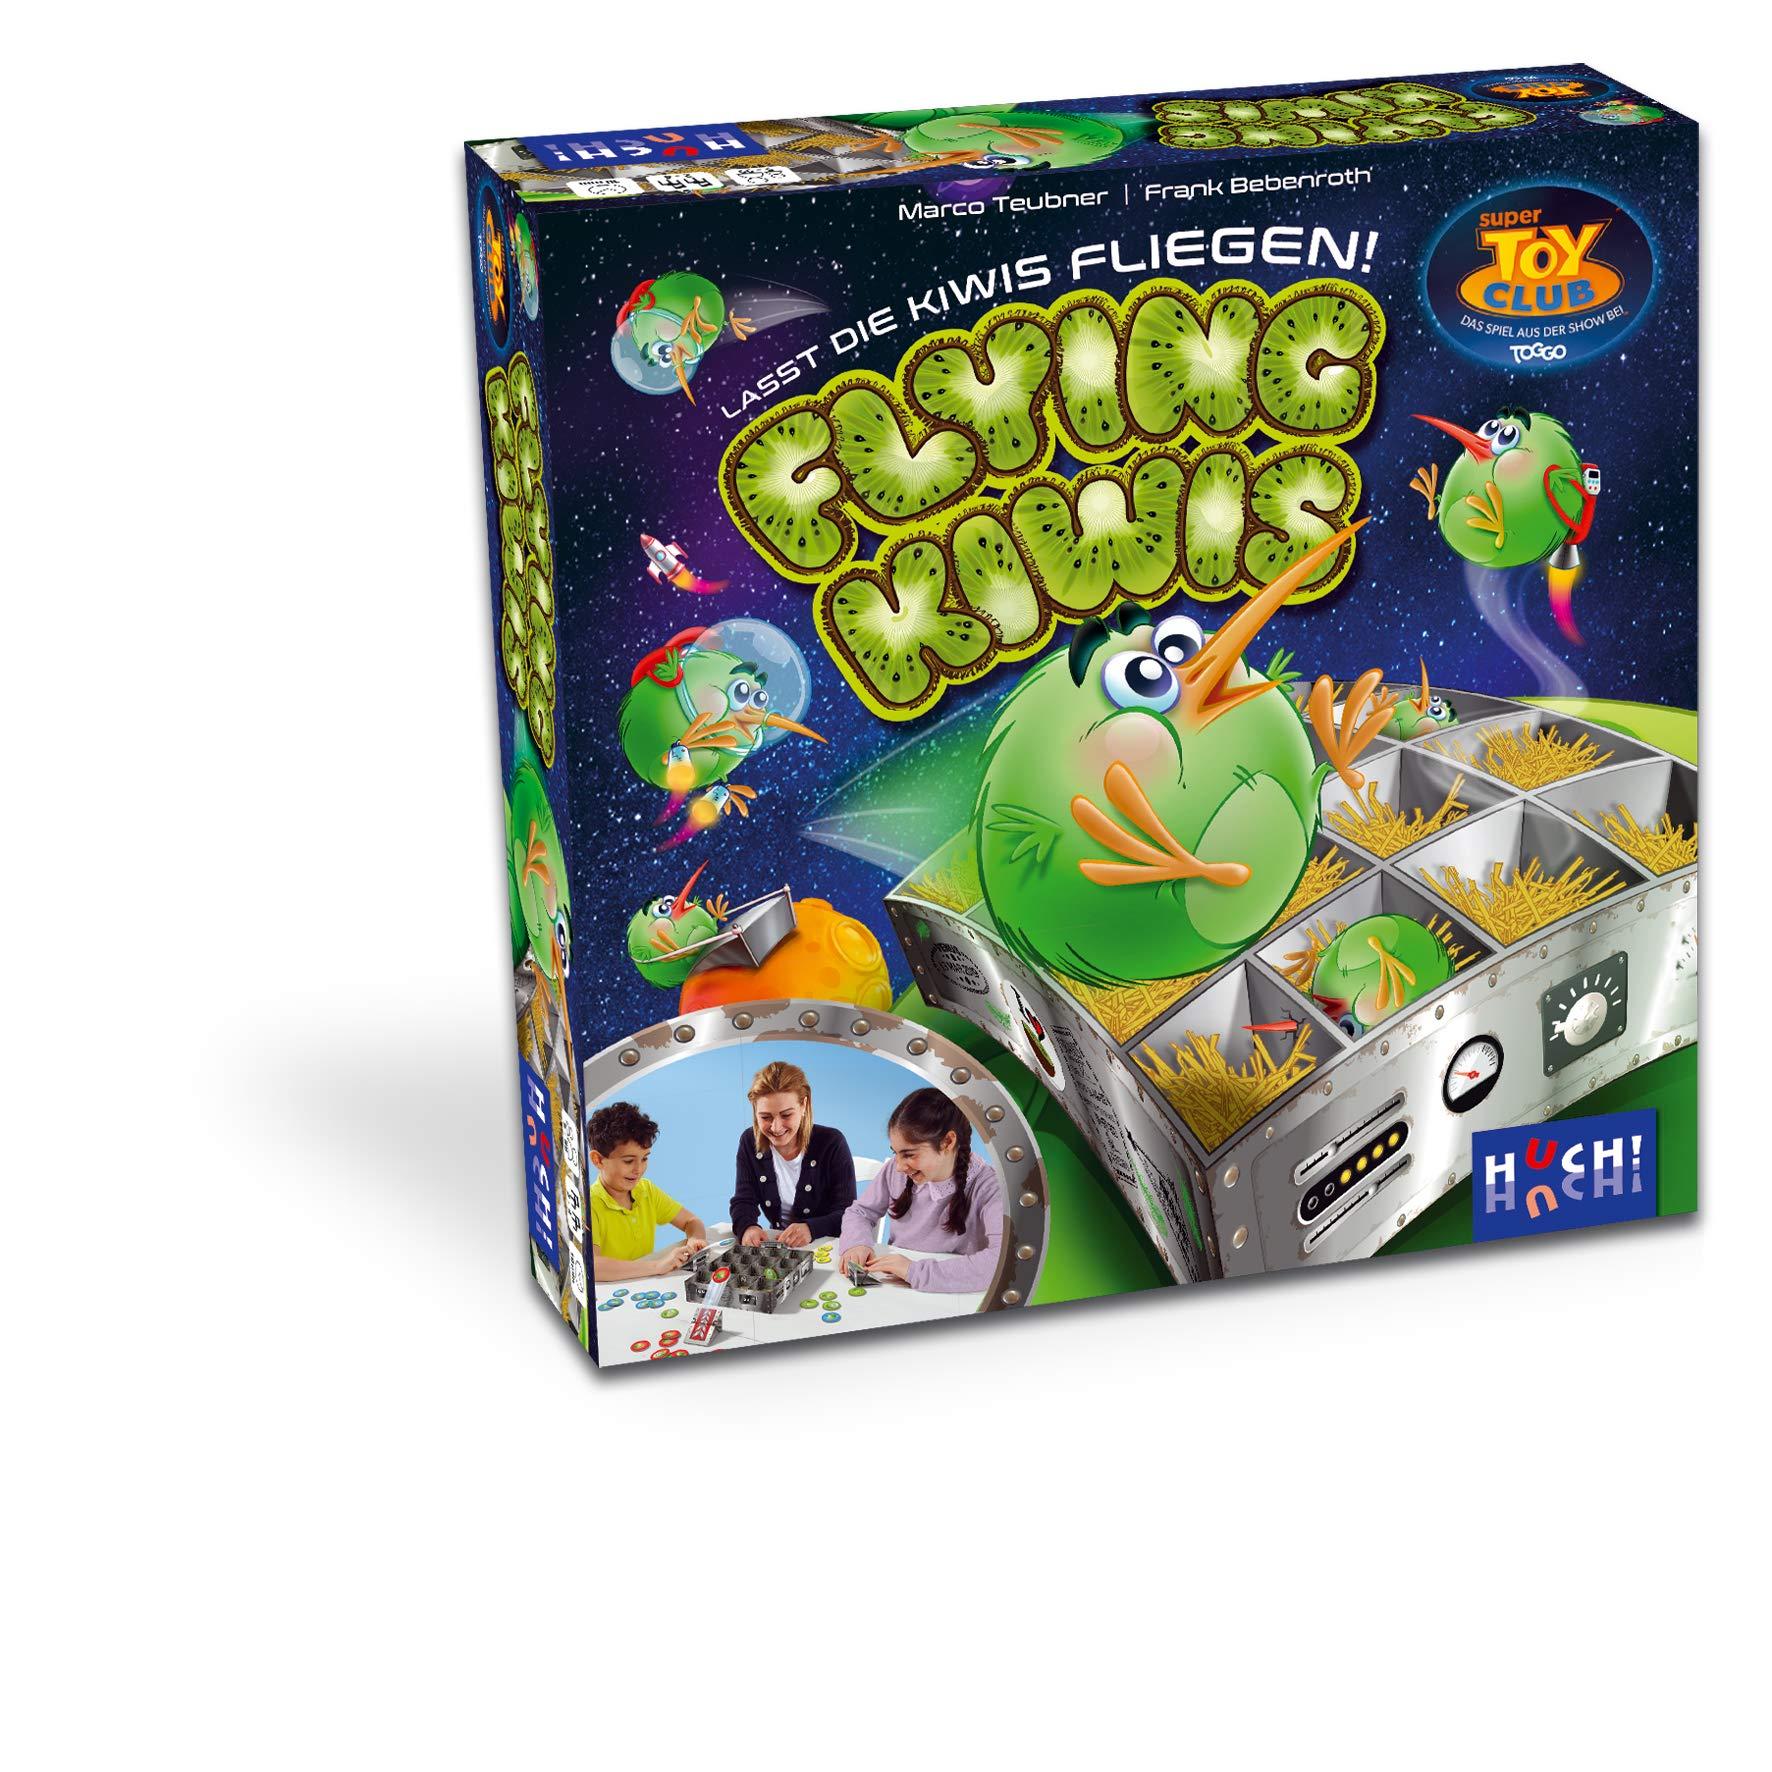 Flying Kiwis: Teubner, Marco, Bebenroth, Frank: Amazon.es: Juguetes y juegos